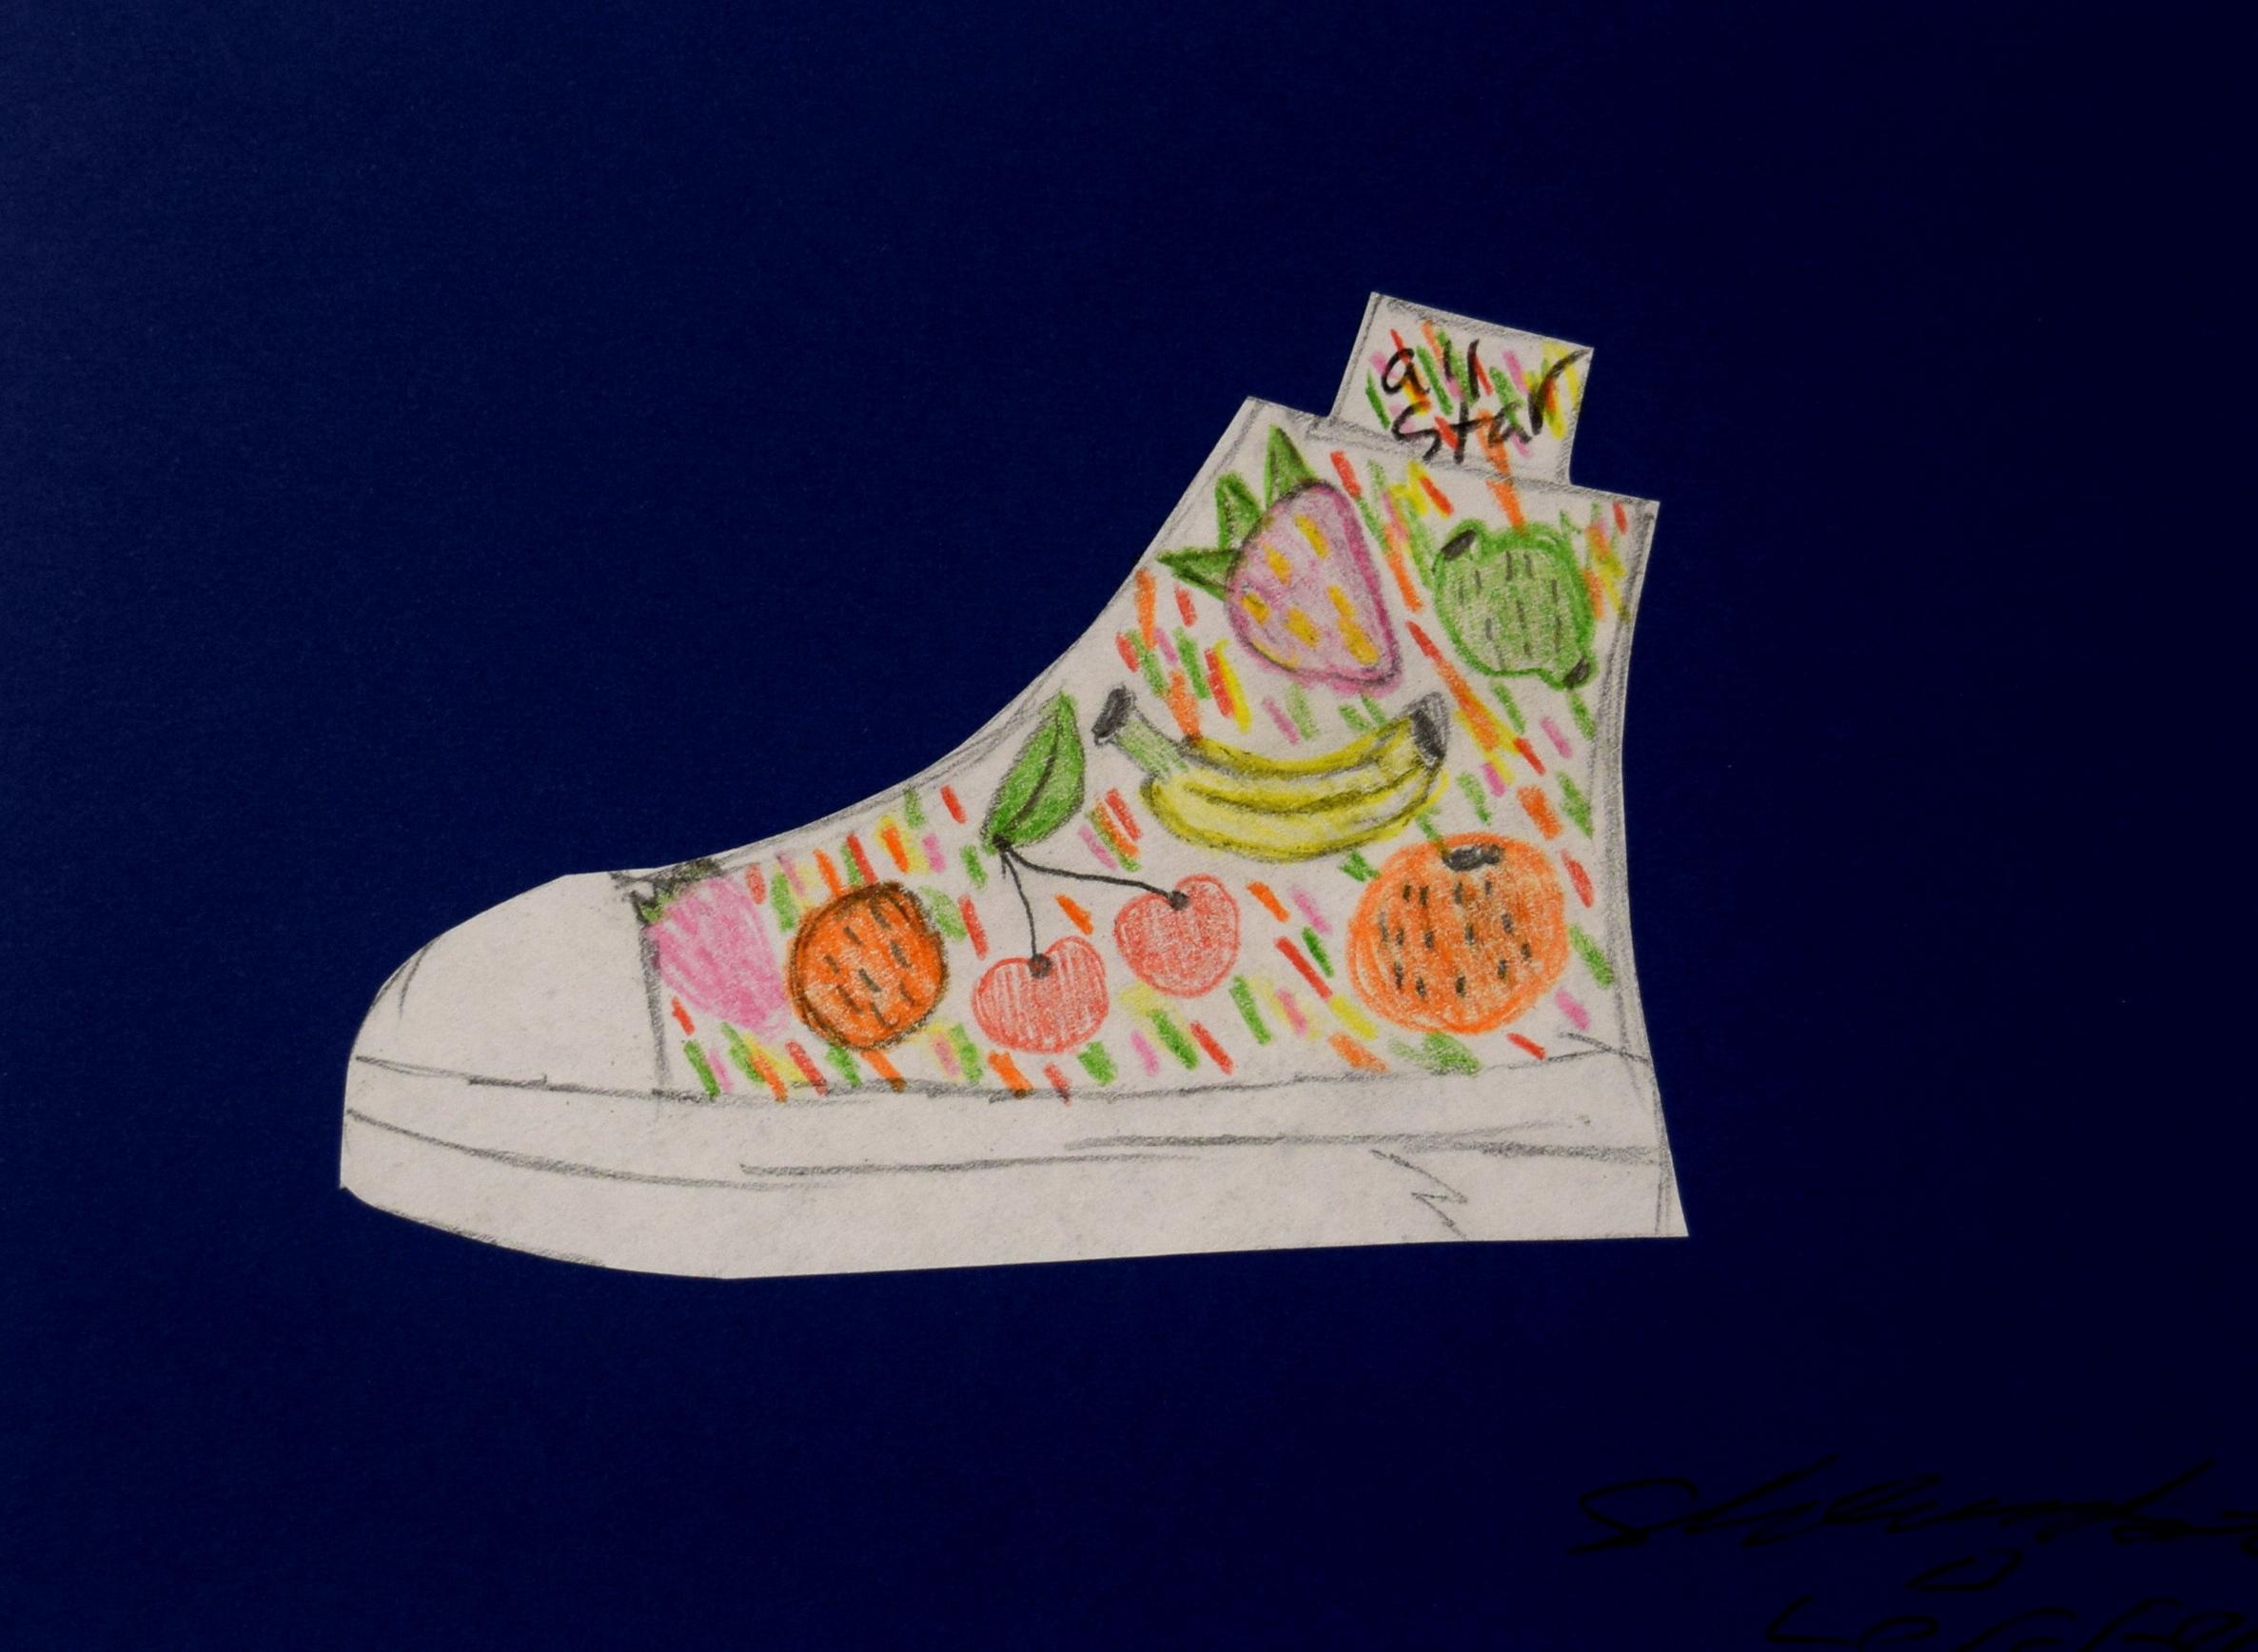 Fruit Shoe  Shambria Loffer   Colored Pencil   Print on 8x10 $20